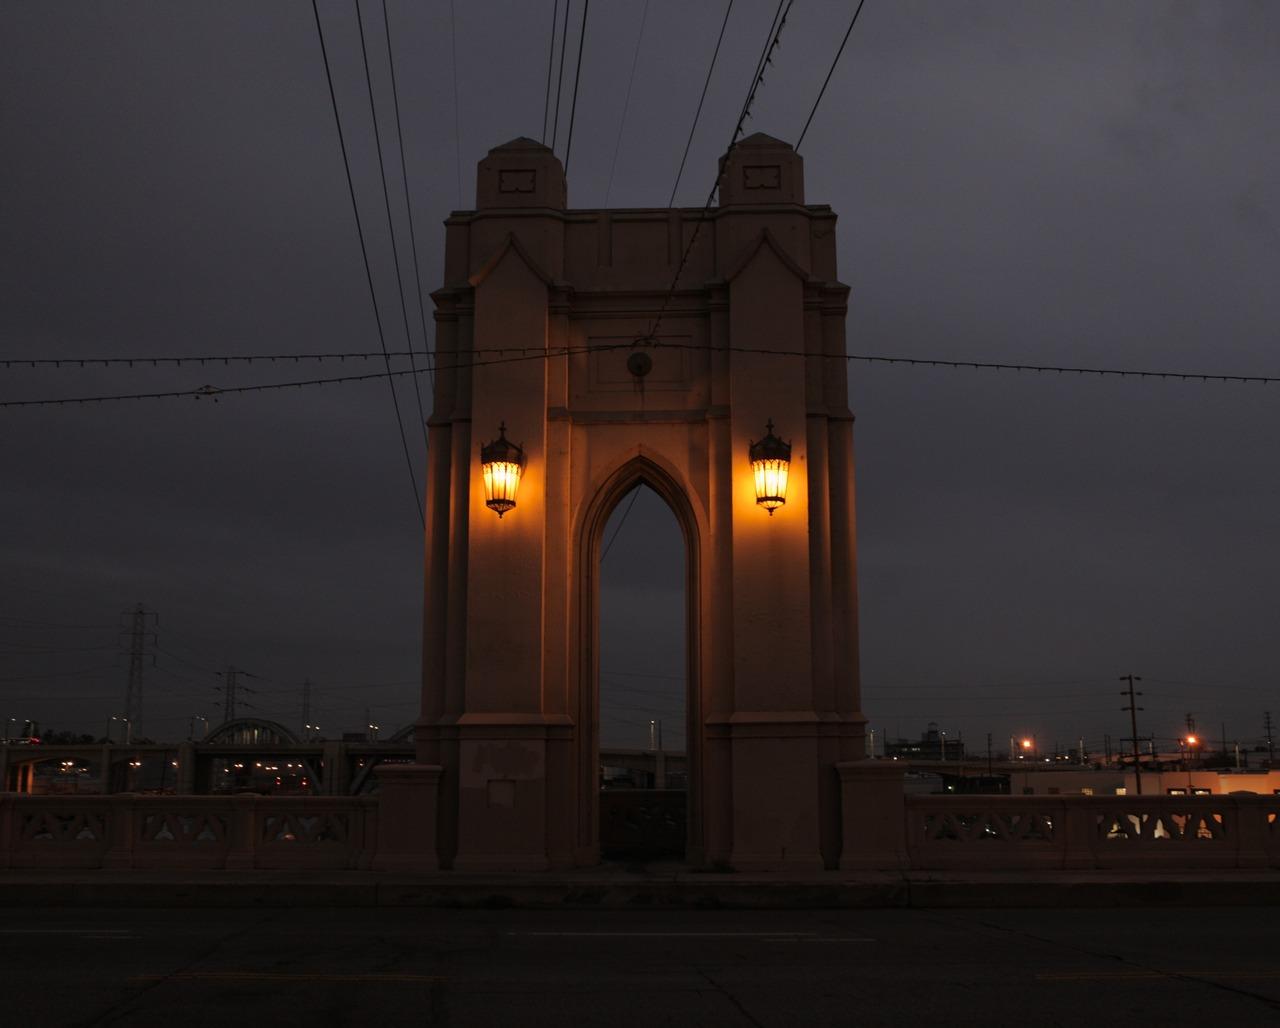 4th st. bridge